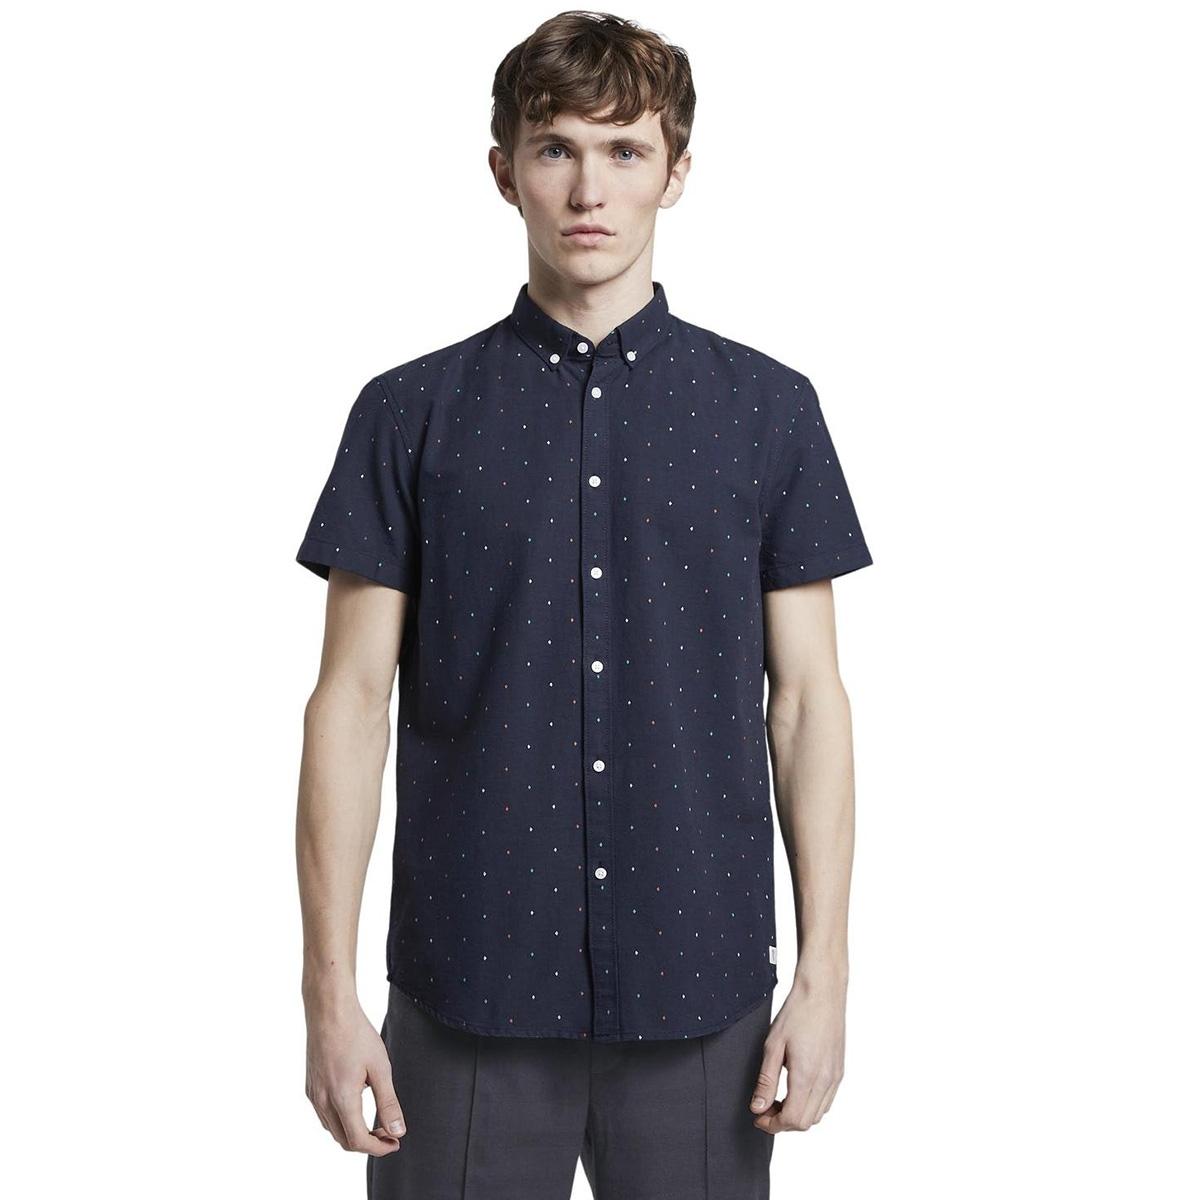 hemd met korte mouwen 1018859xx12 tom tailor overhemd 22815